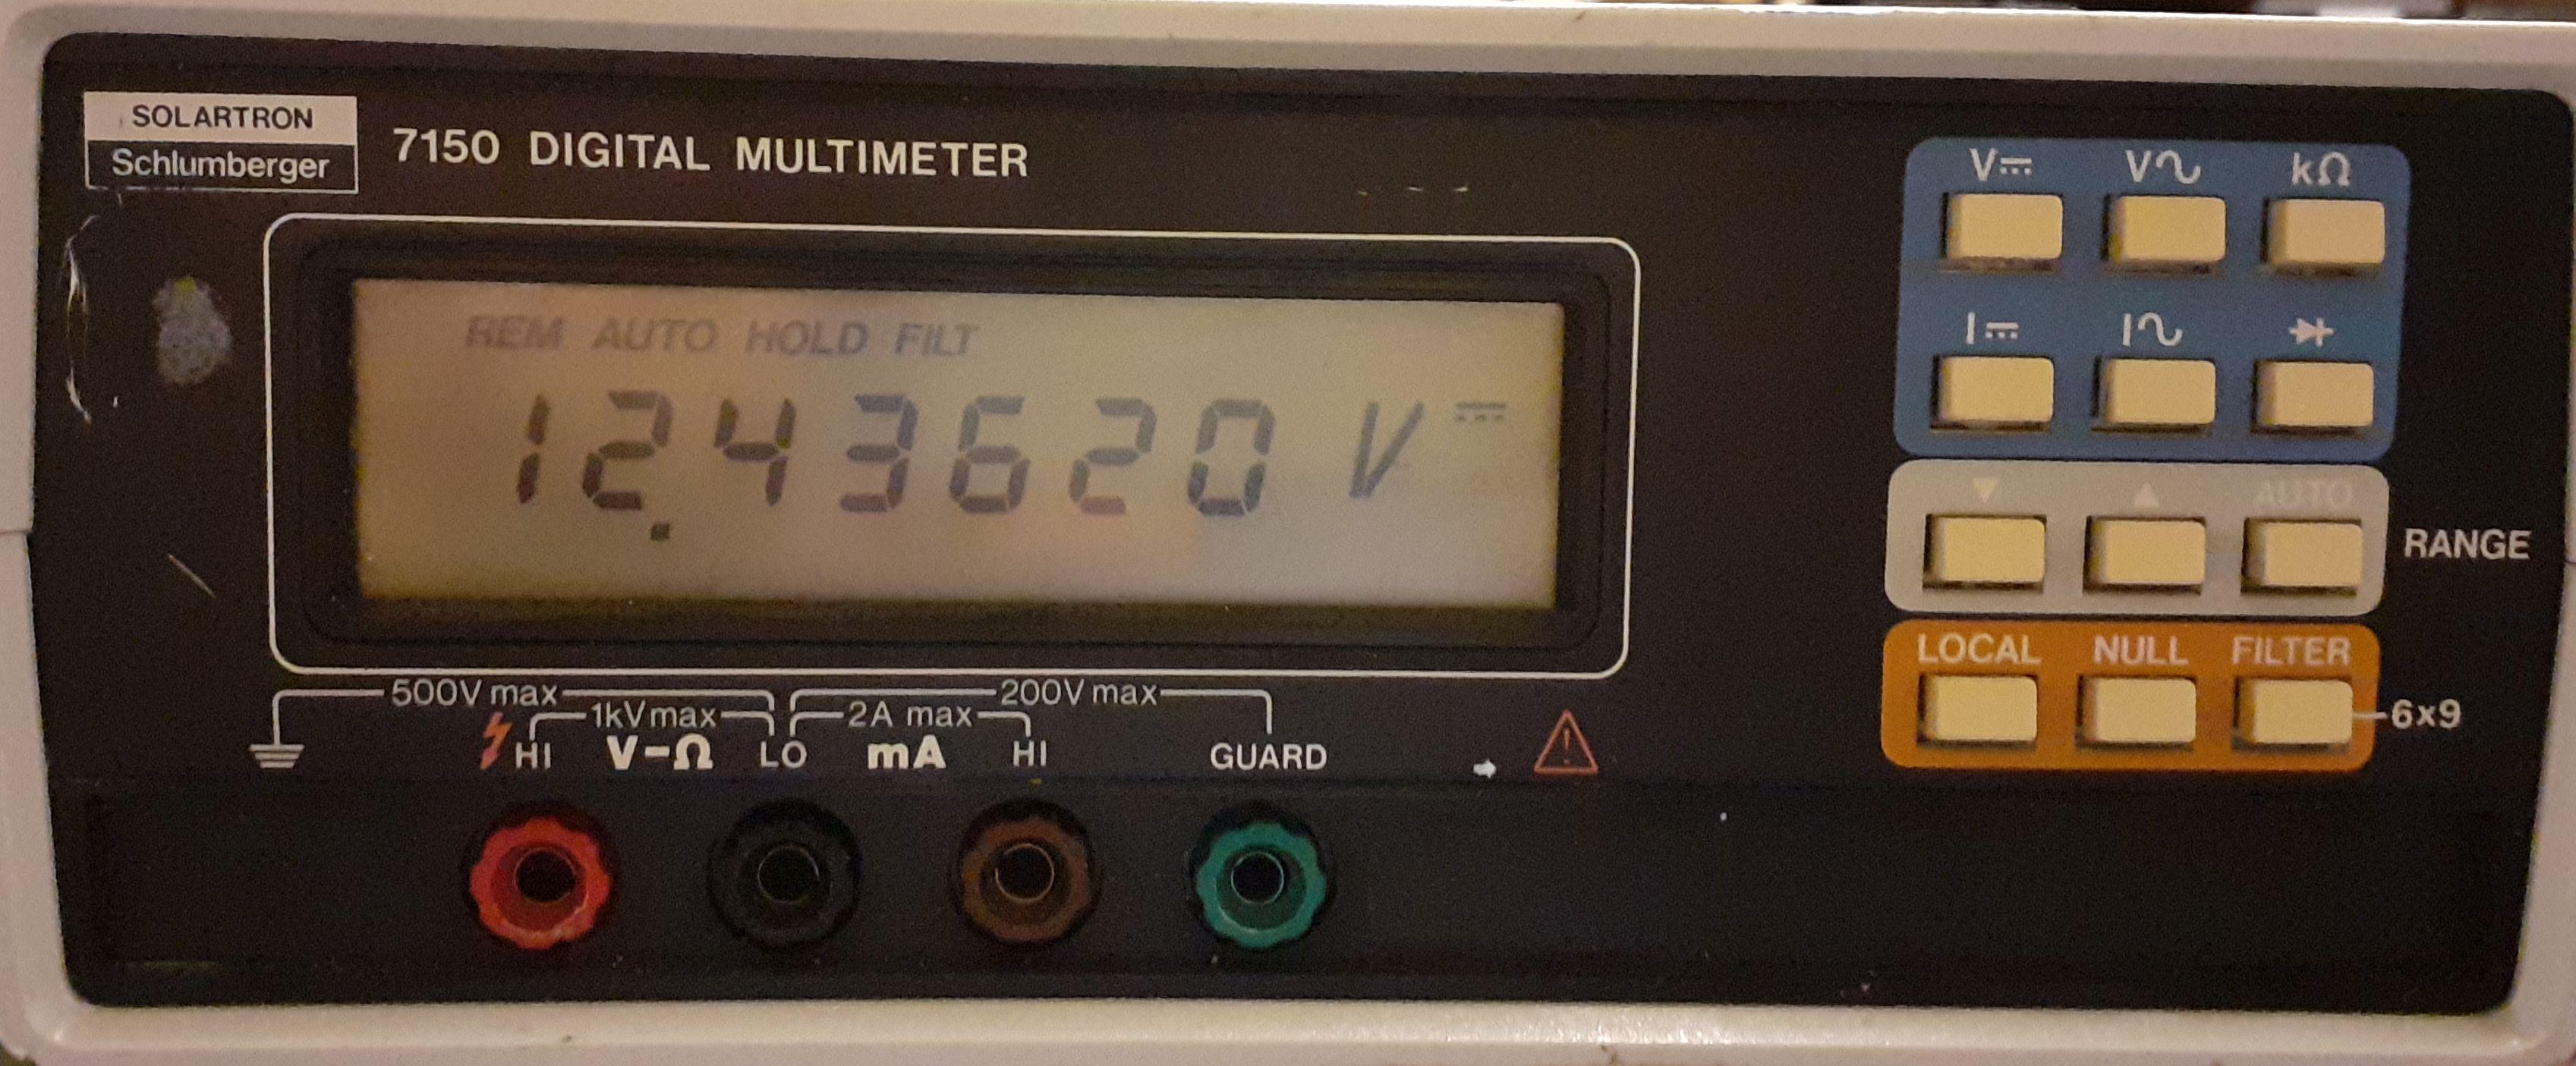 Solartron 7150